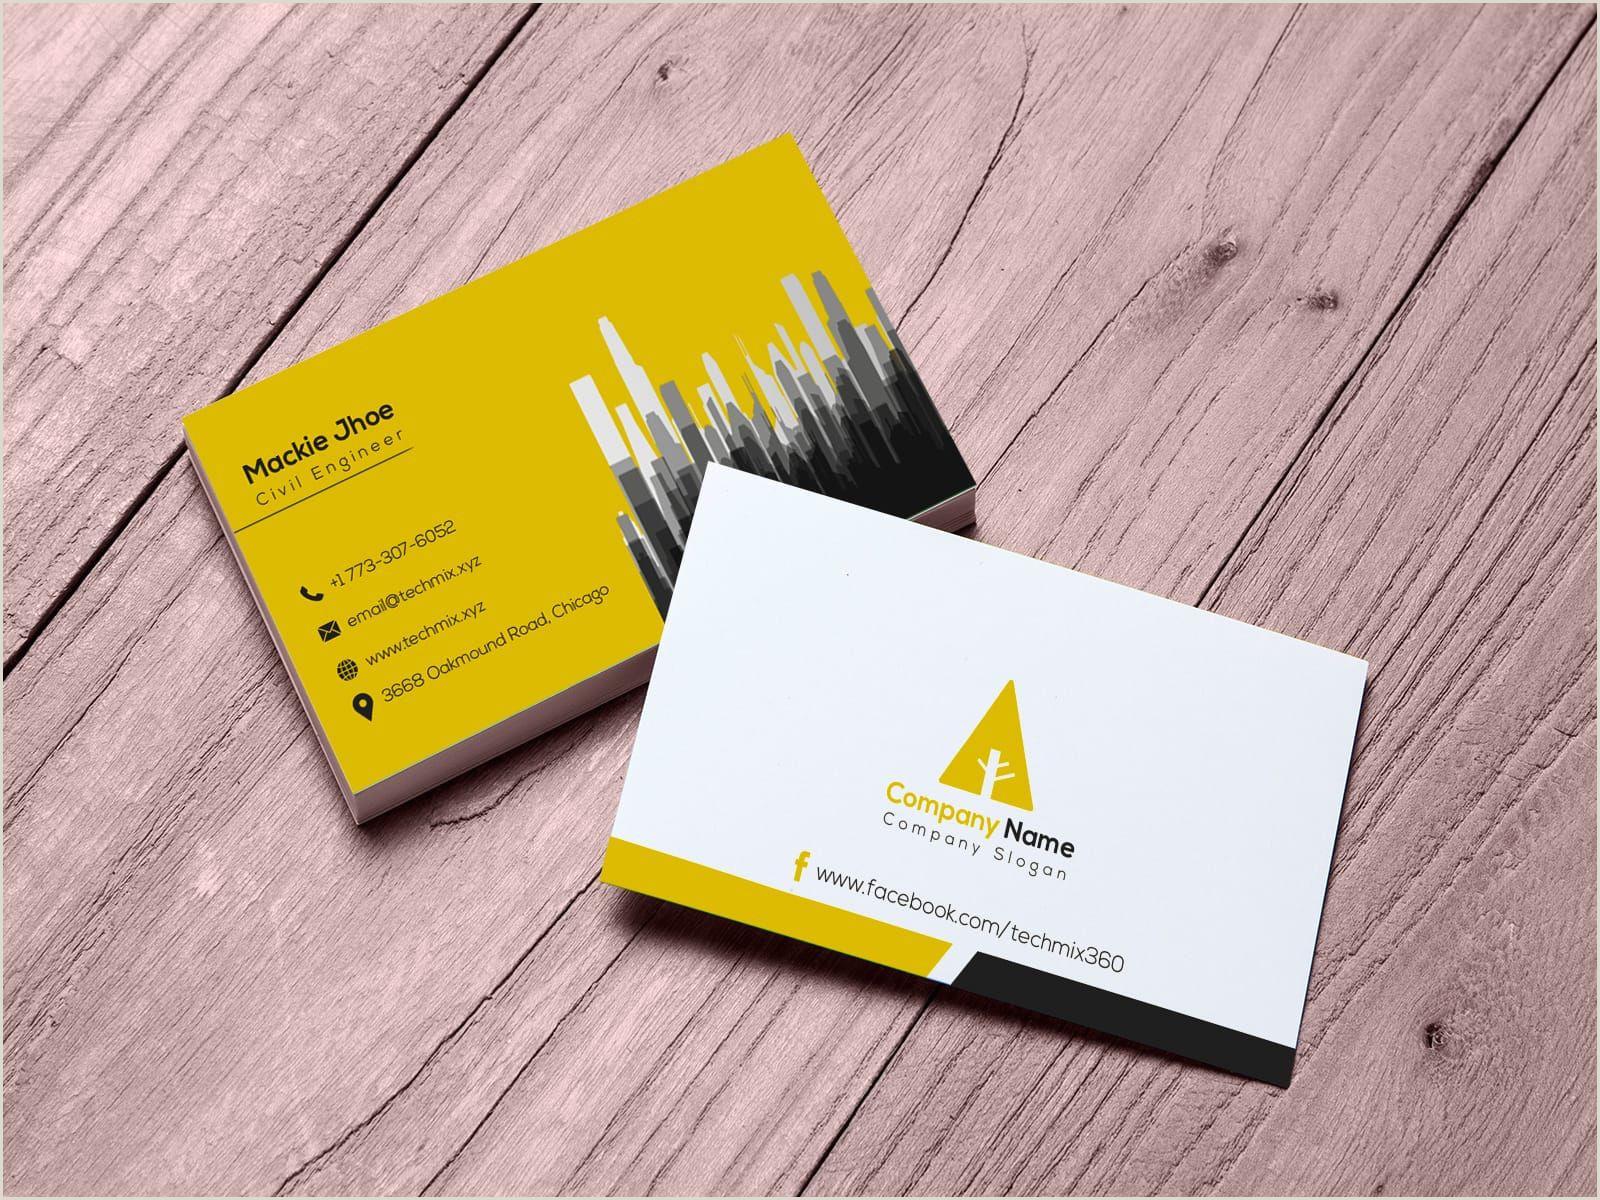 Visting Card 10 Civil Engineer Business Cards Images